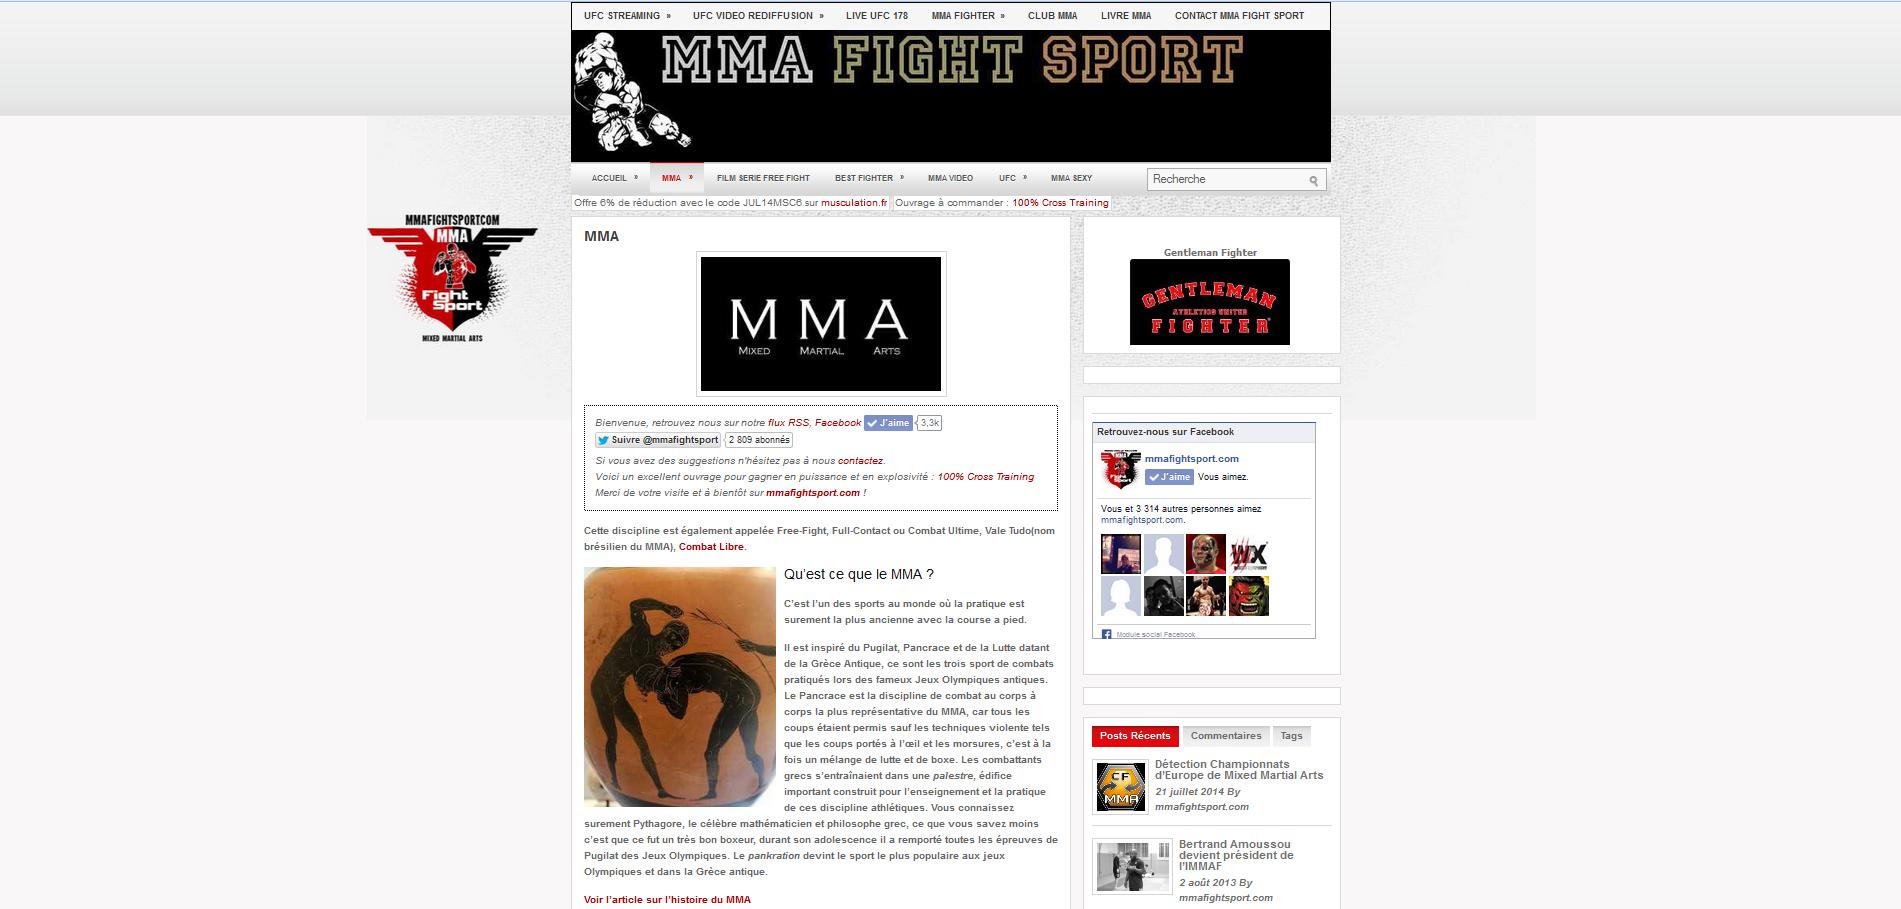 MMA-Fightsport